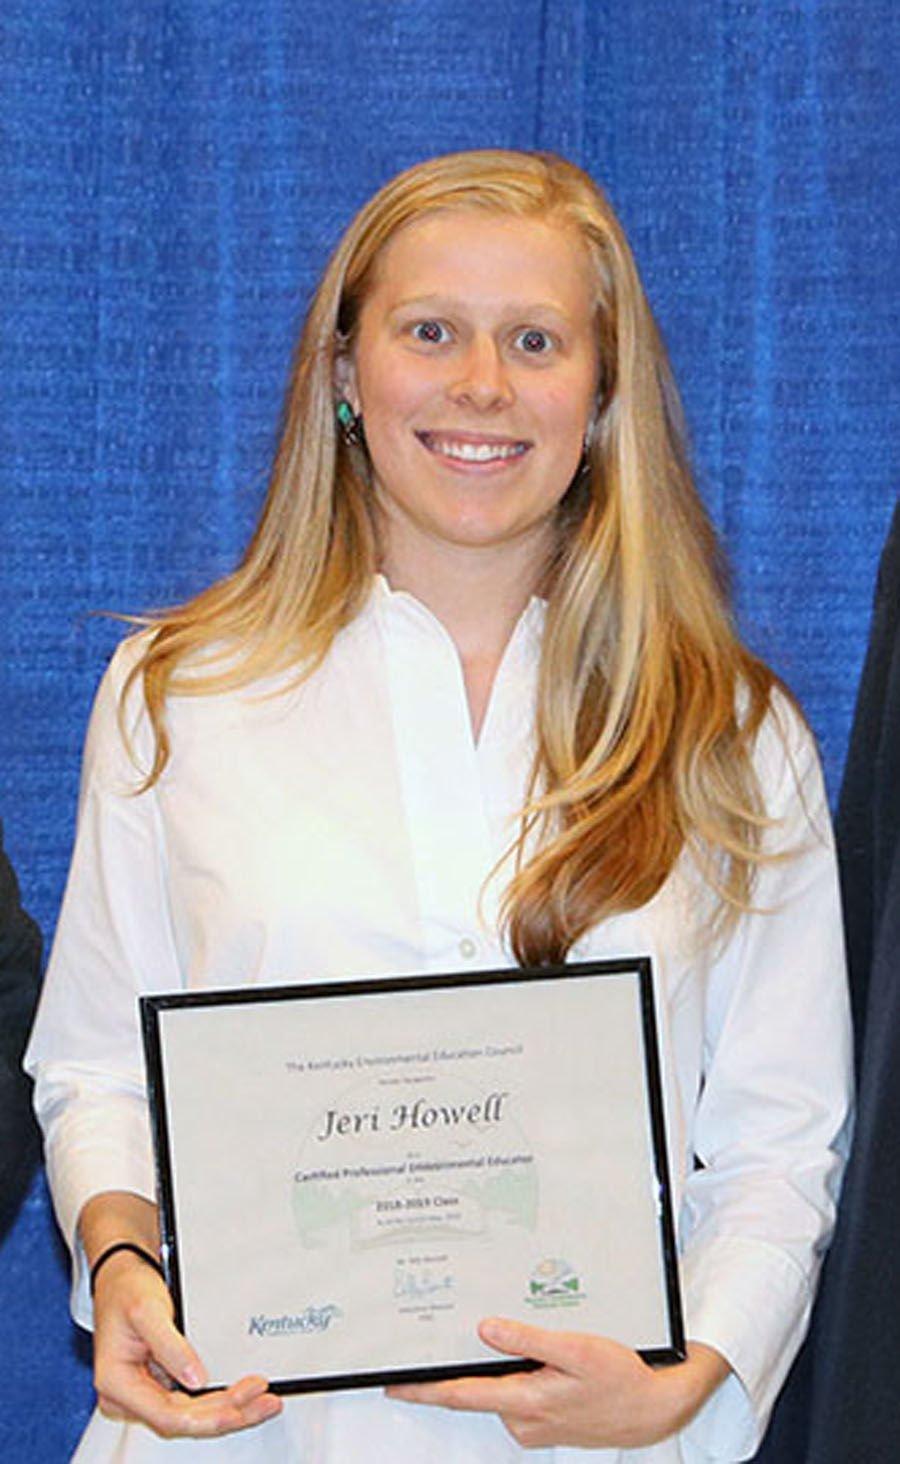 Jeri Howell